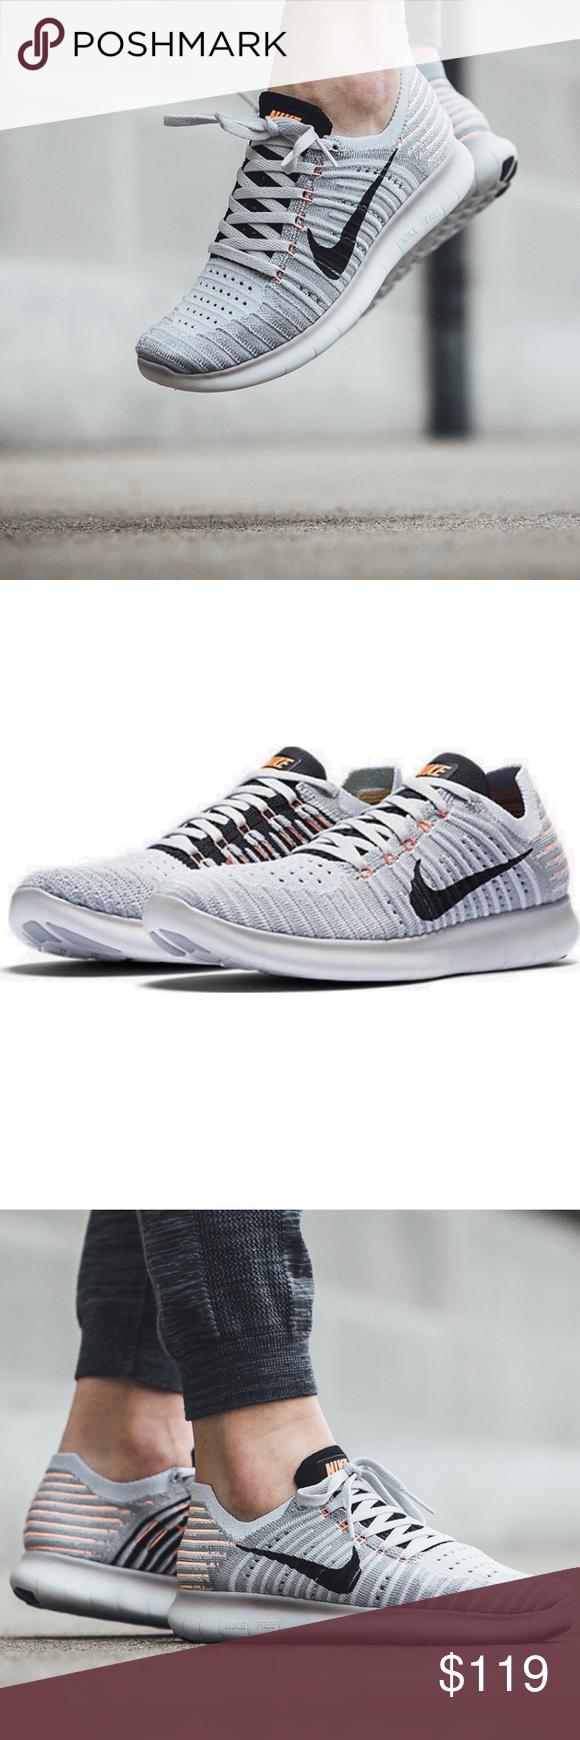 16bc87b08ffb New Nike Women s Free Run FlyKnit 831070-005 Women s Size 6 or 6.5 Wolf  Grey-Bright Mango-Pure Platinum-Black  No Original Box-Brand New  More  cushioned ...